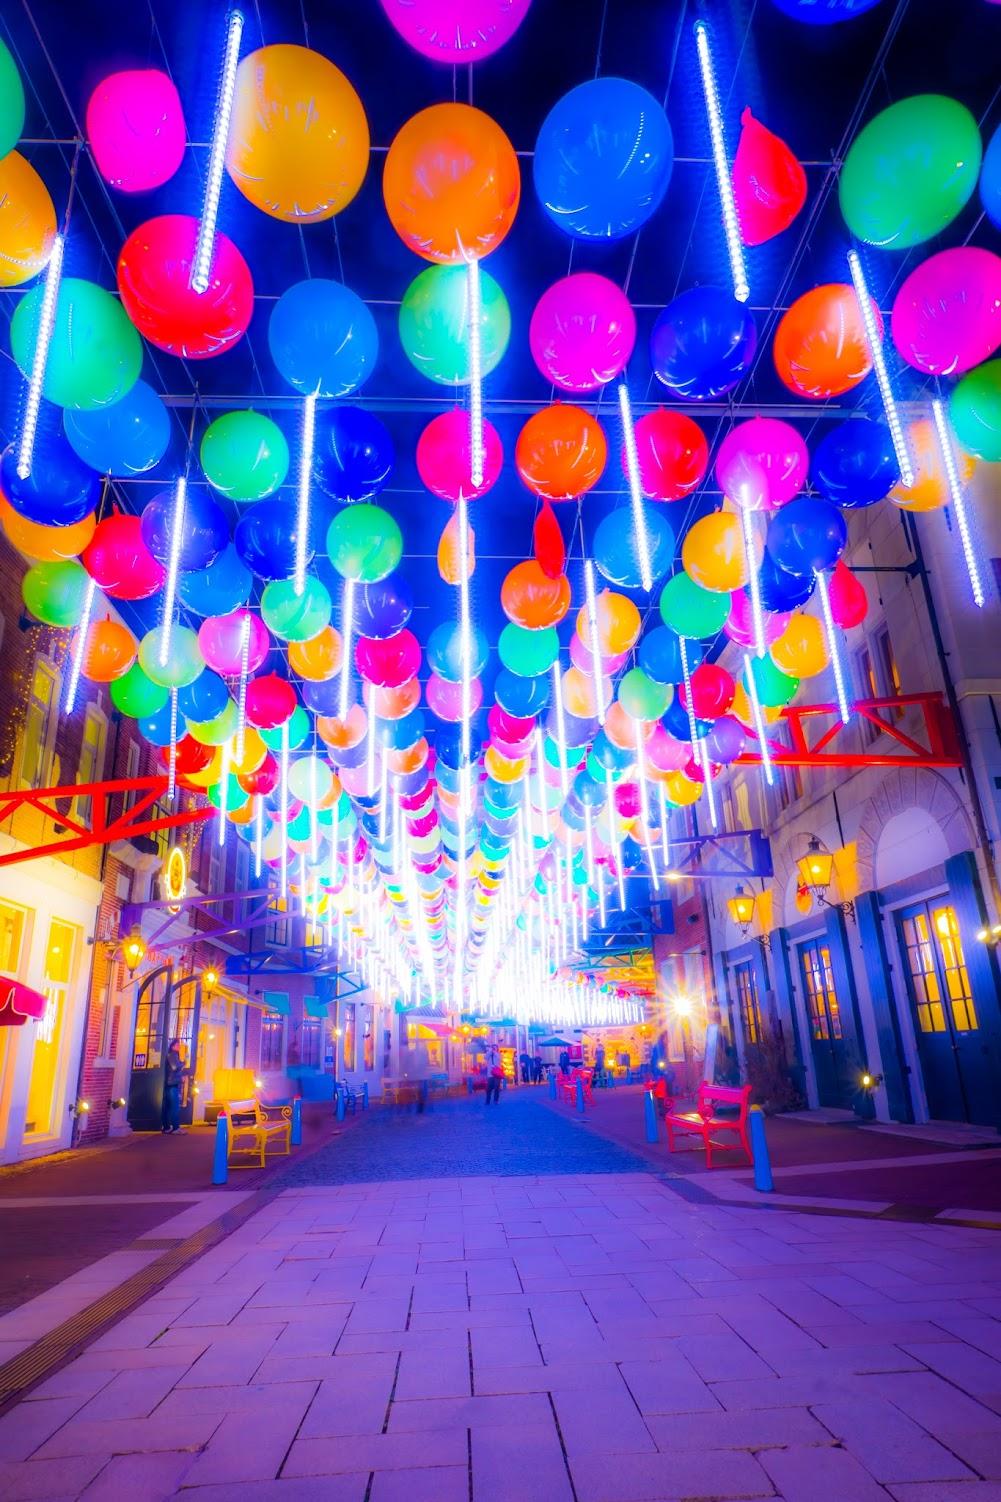 Huis Ten Bosch illumination Kingdom of light Happy balloon street3